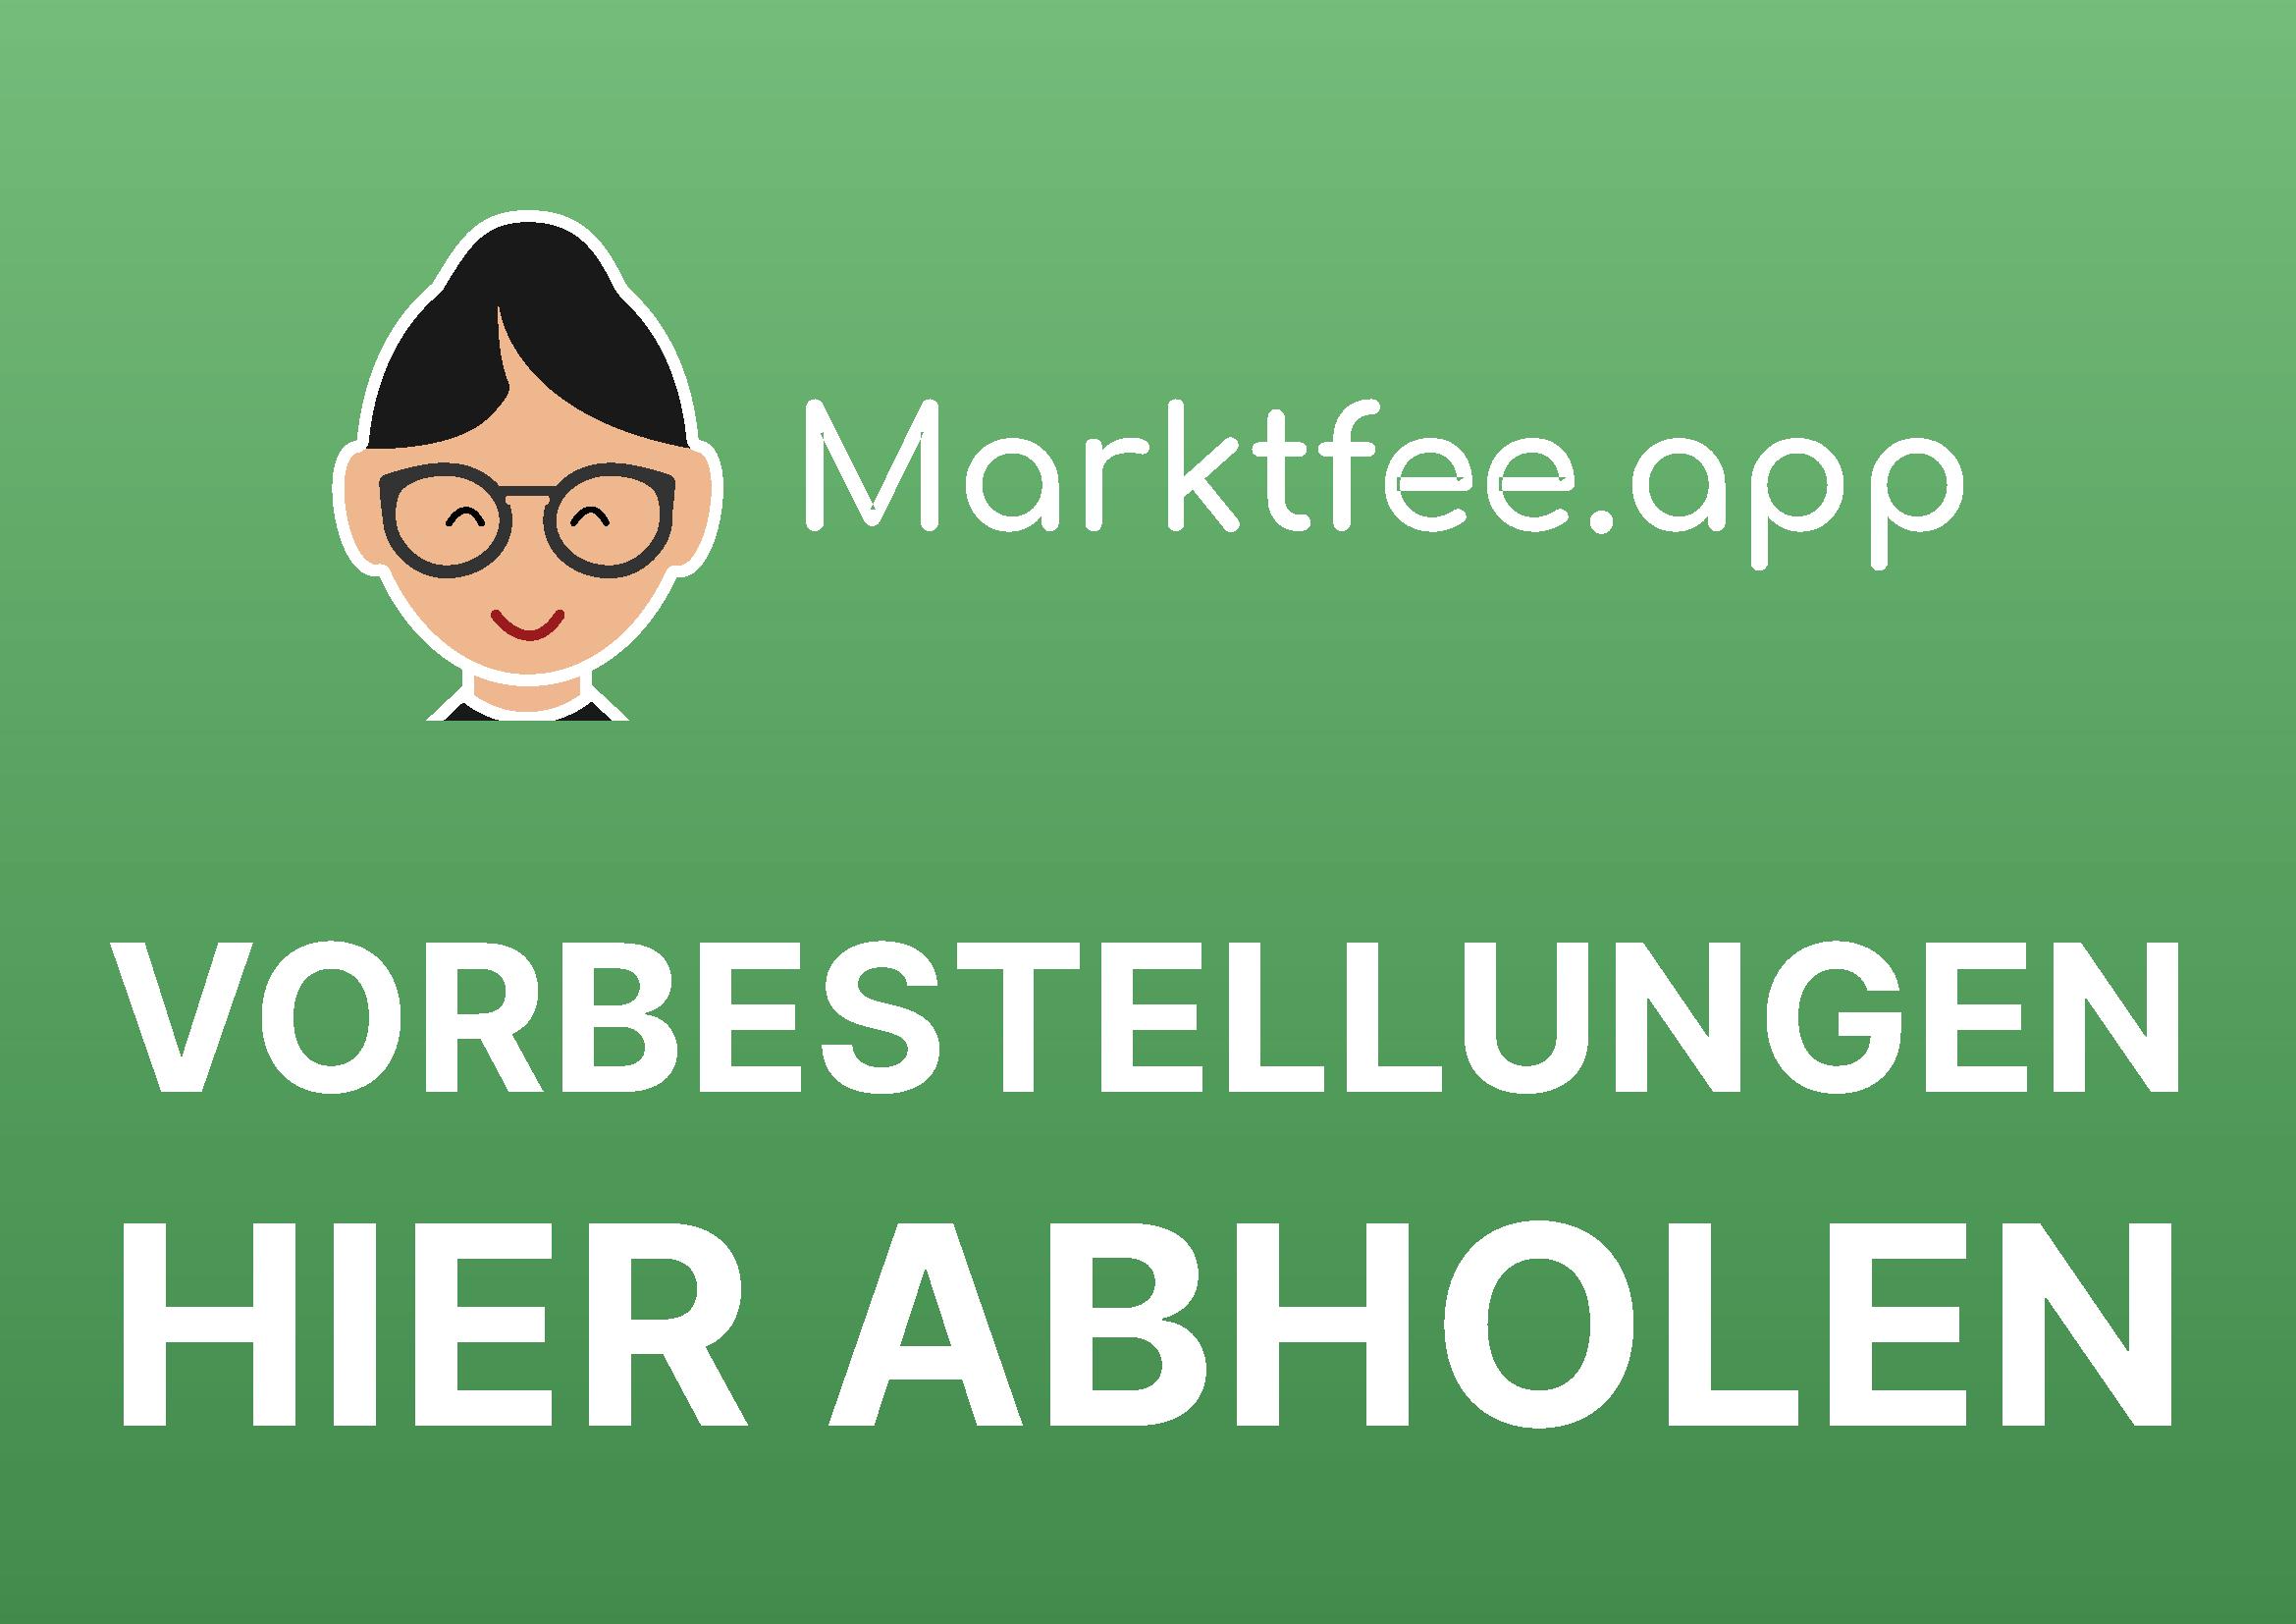 Marktfee.app Abholschild DinA4